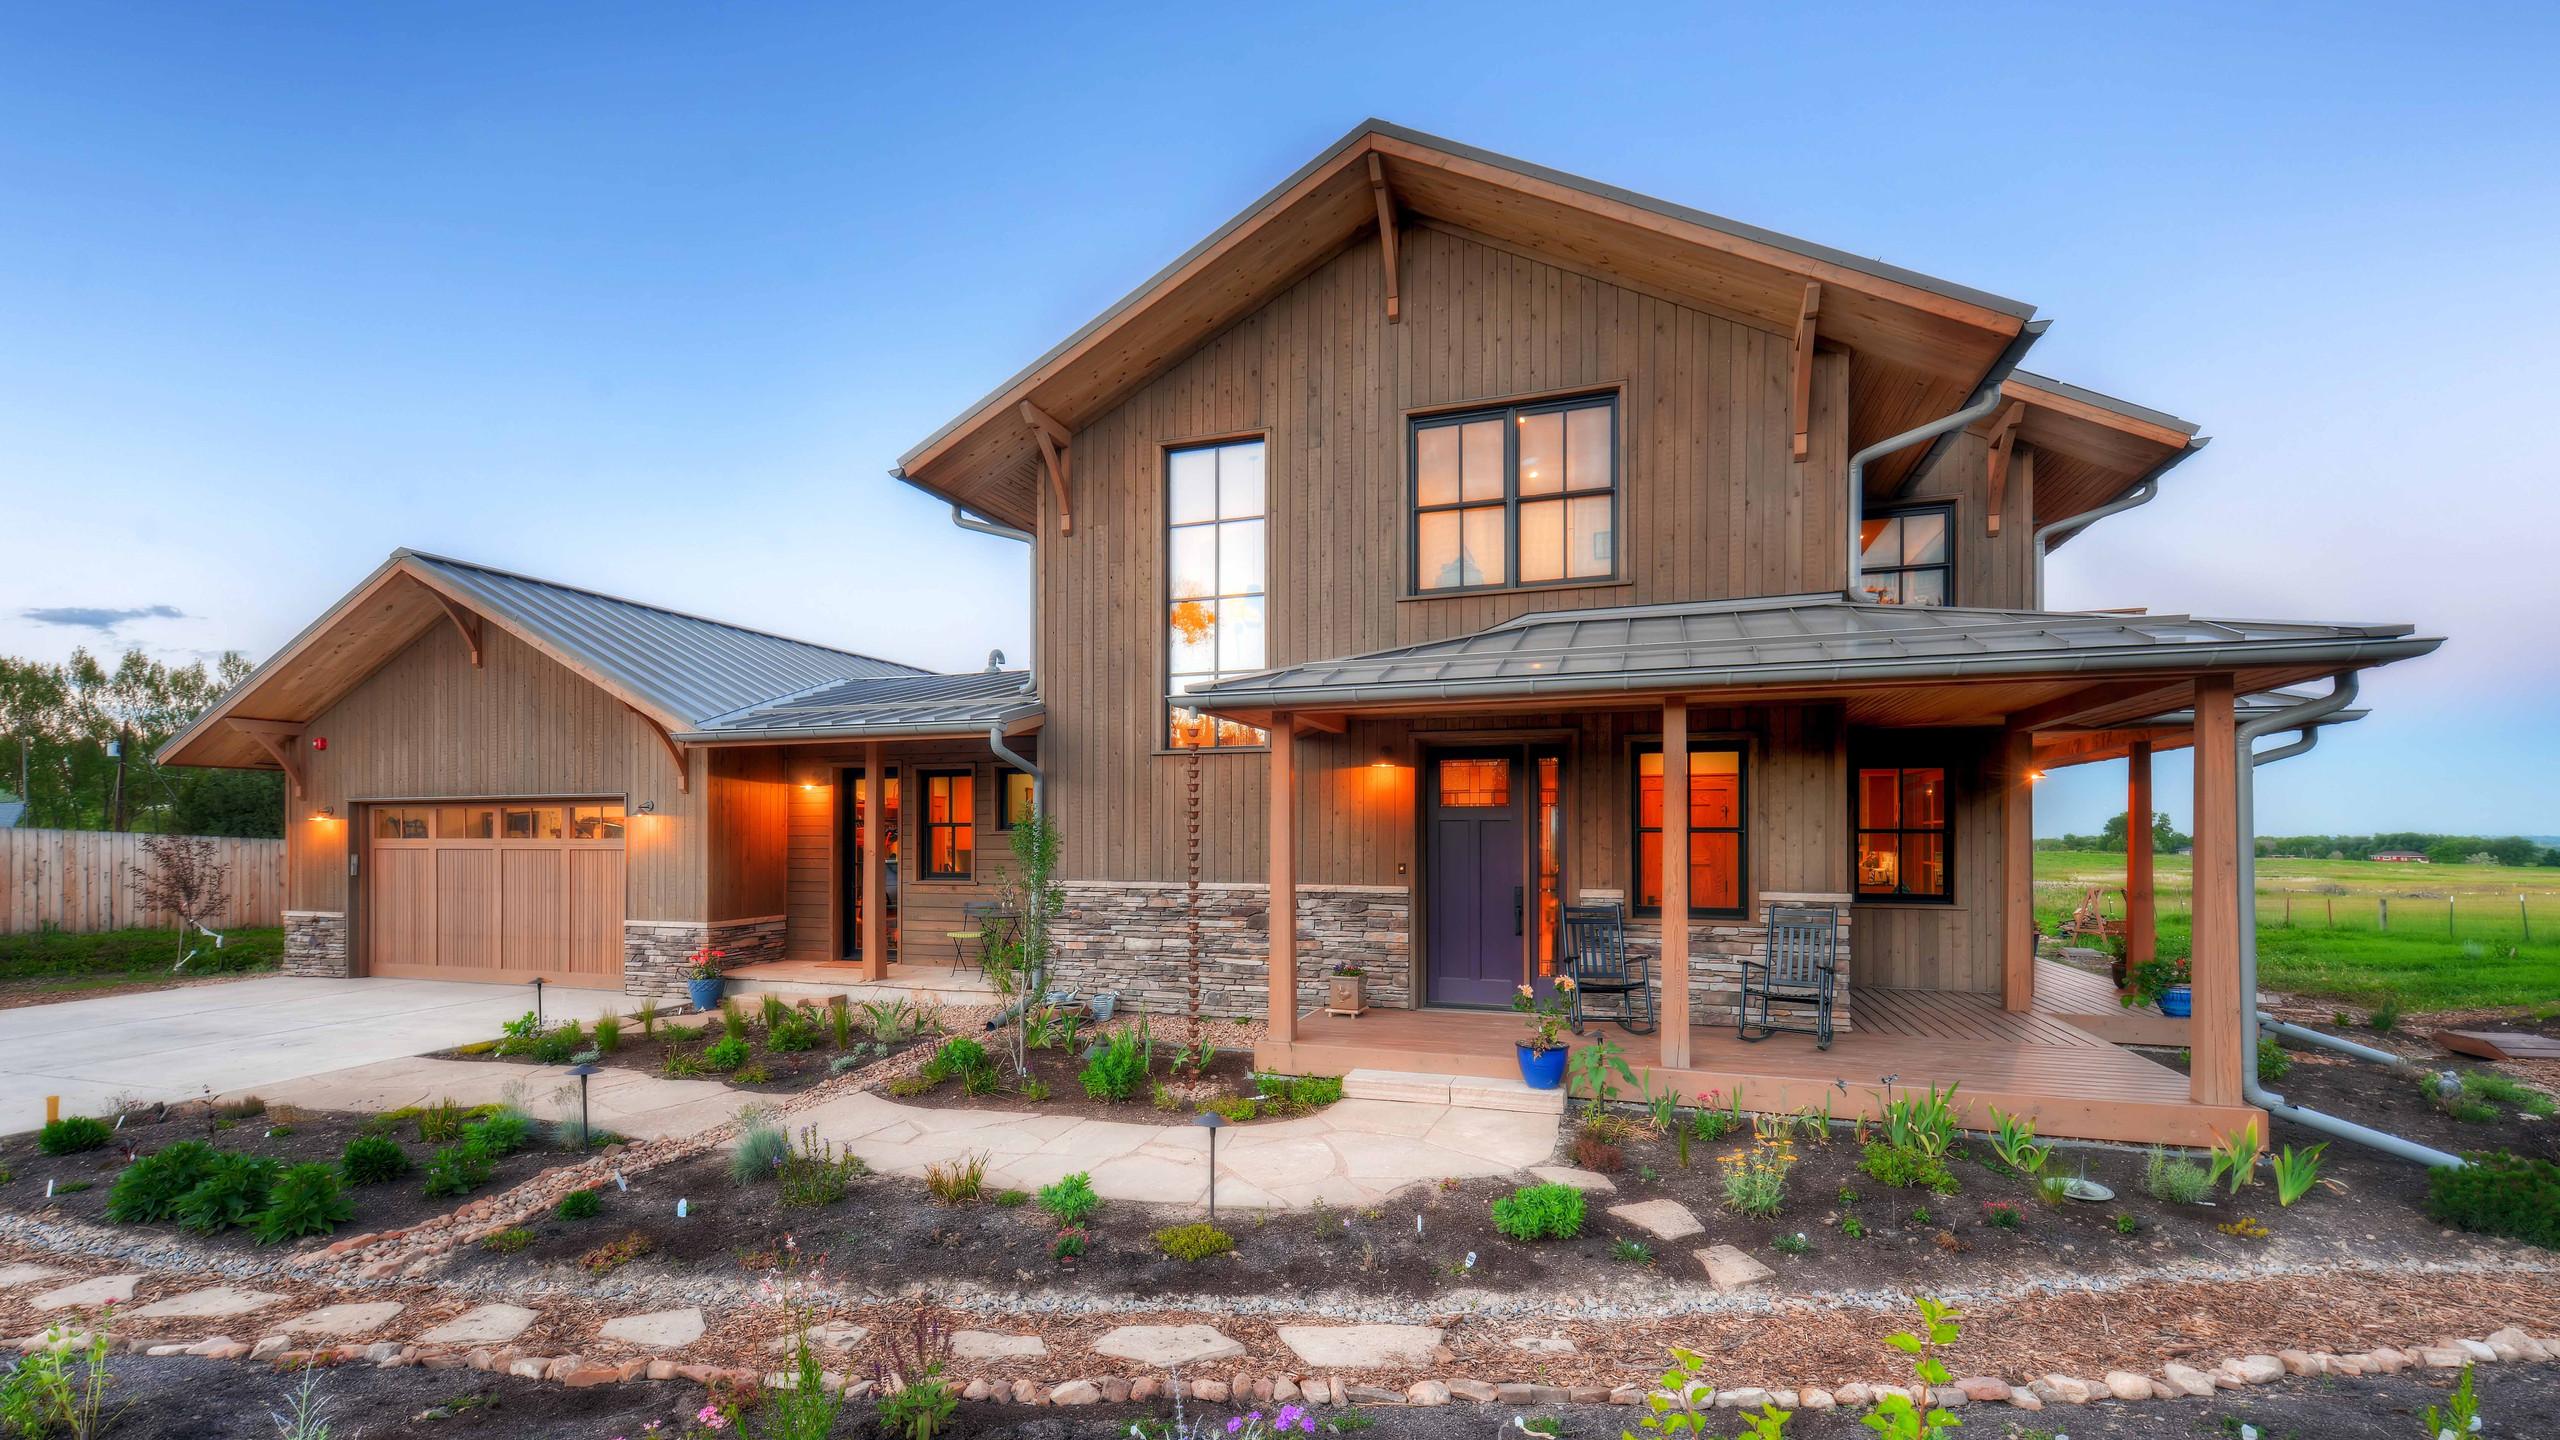 Farmhouse-LEED Platinum Certified